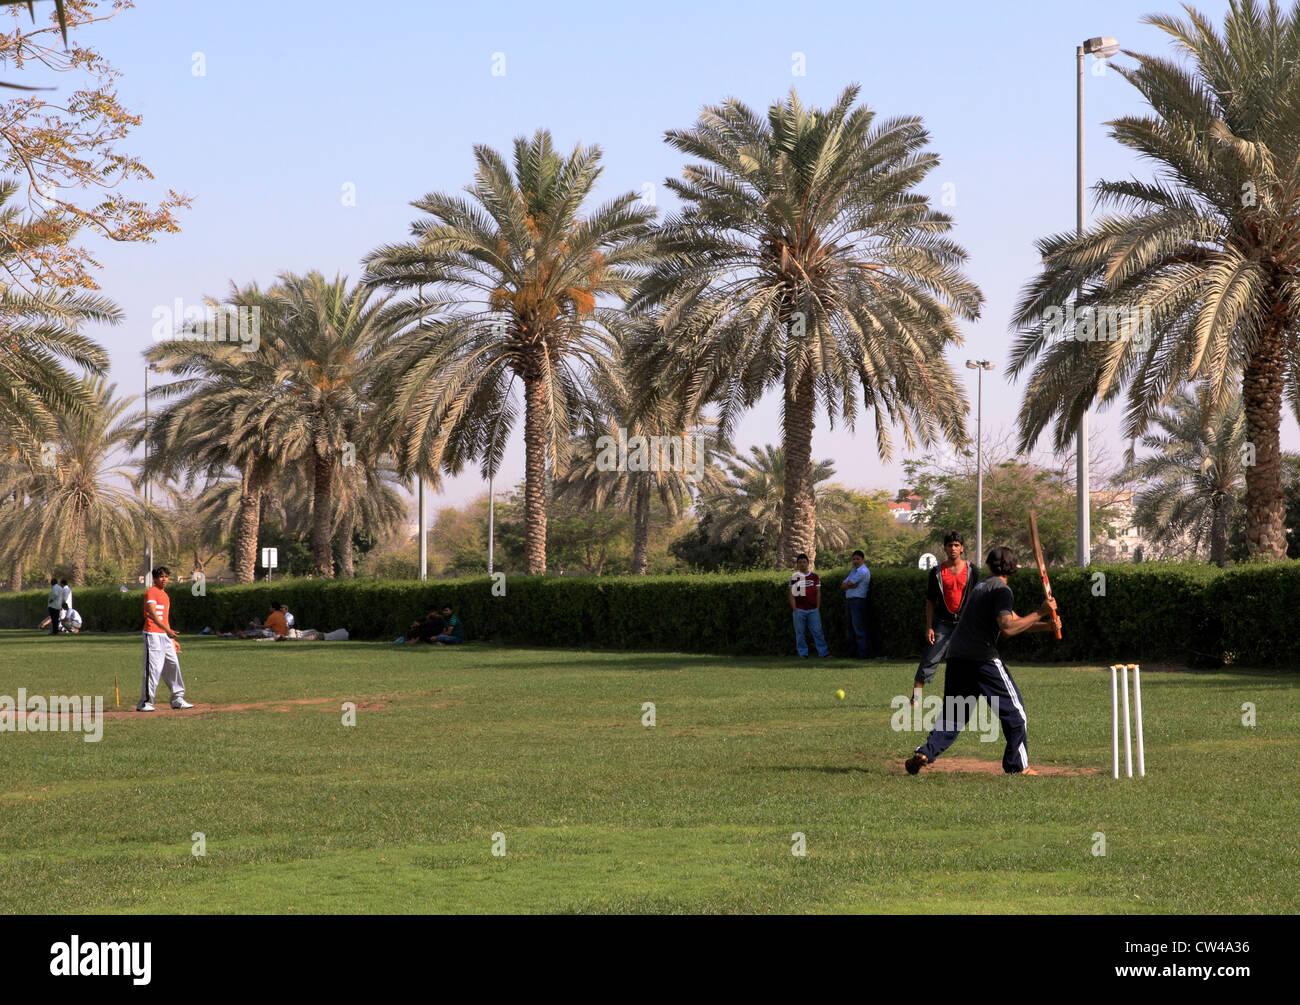 3498. Cricket, Indian & Pakistani workers, Dubai, UAE. - Stock Image